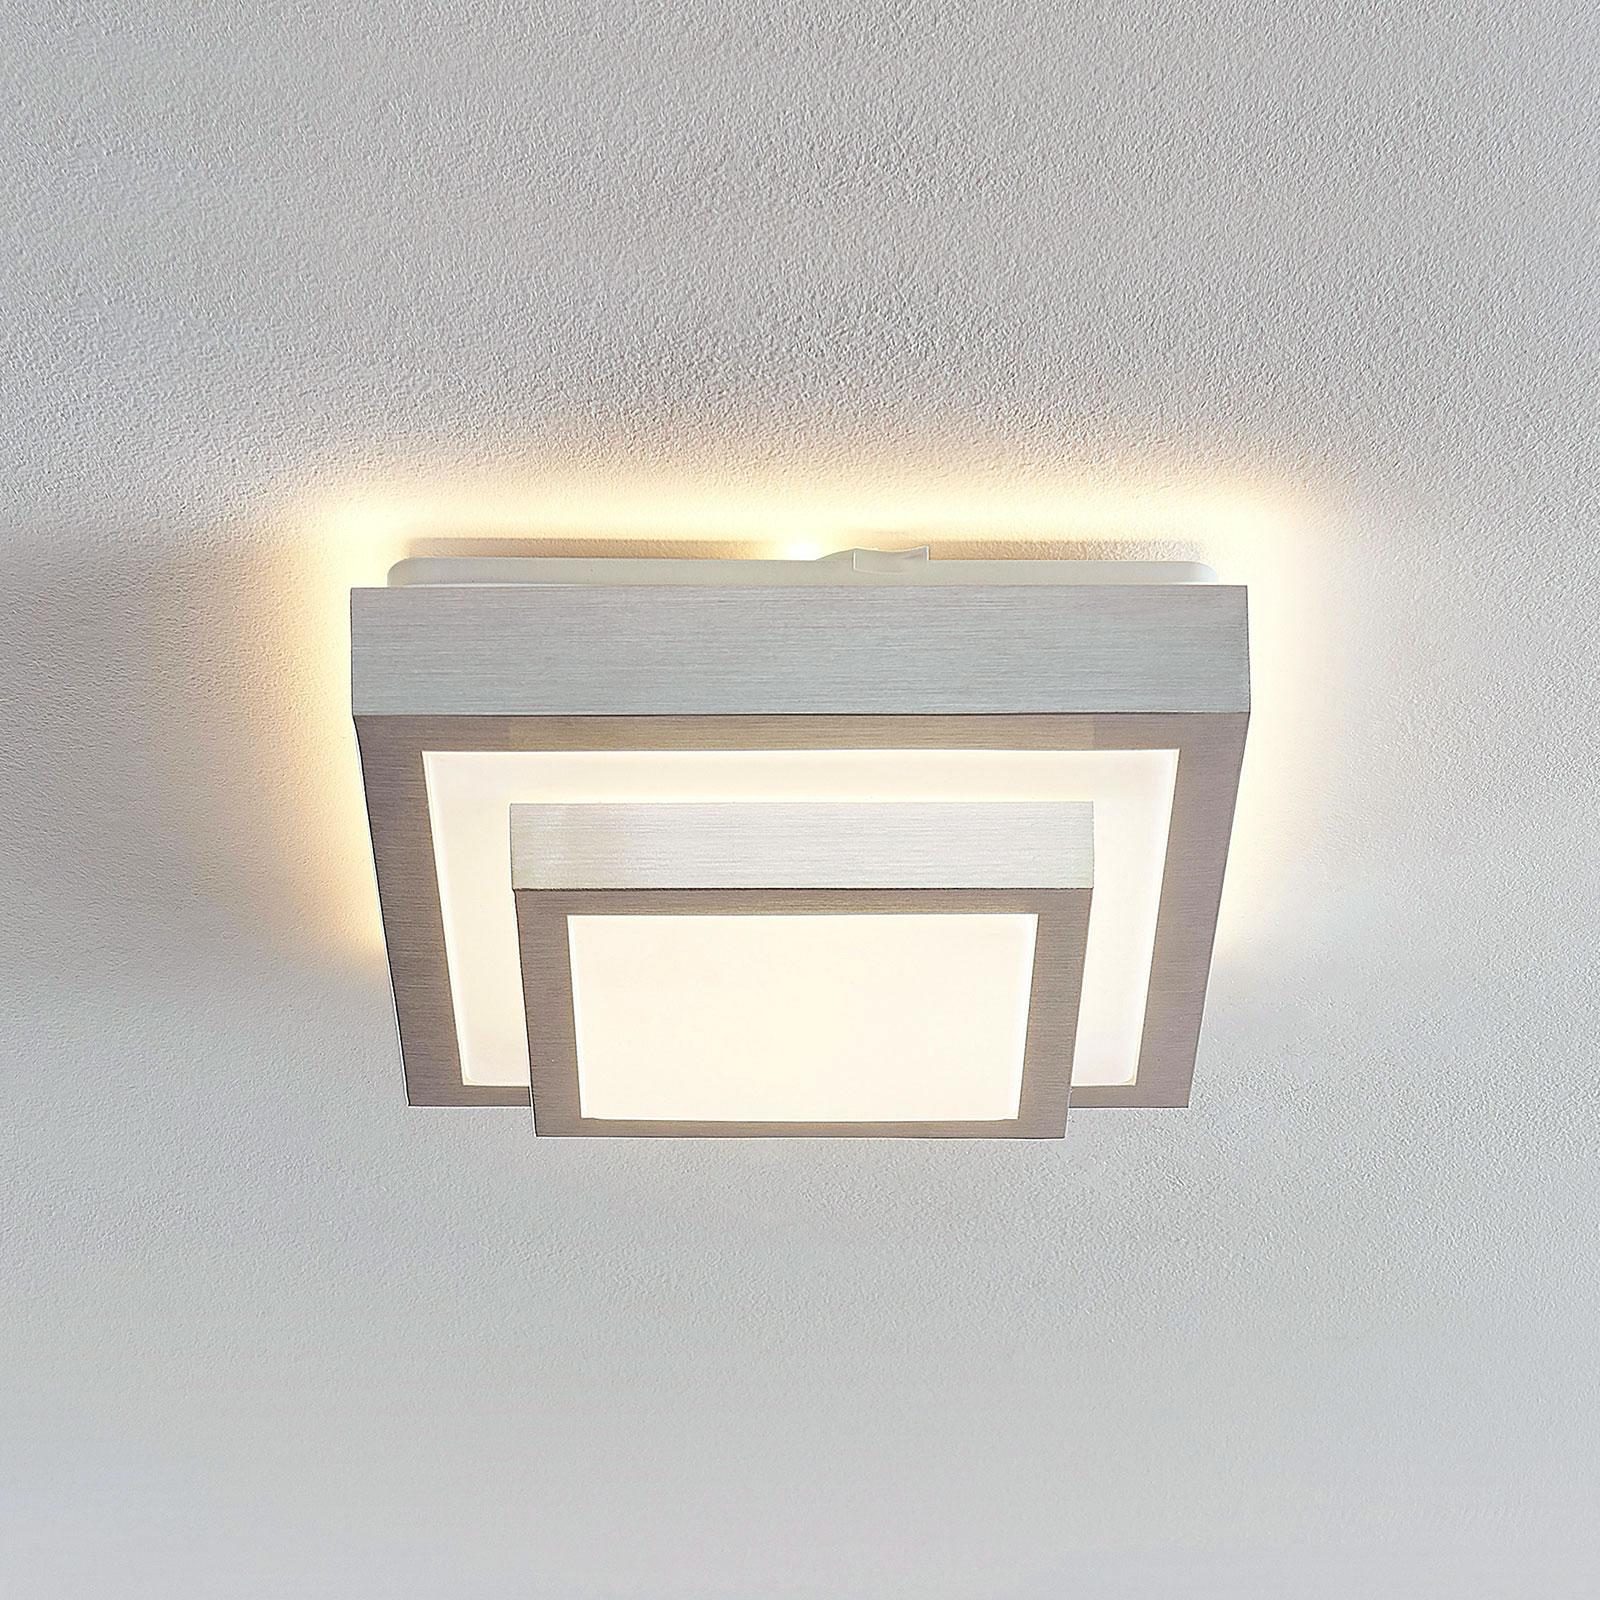 Lindby Mirco plafonnier LED angulaire, 27 cm